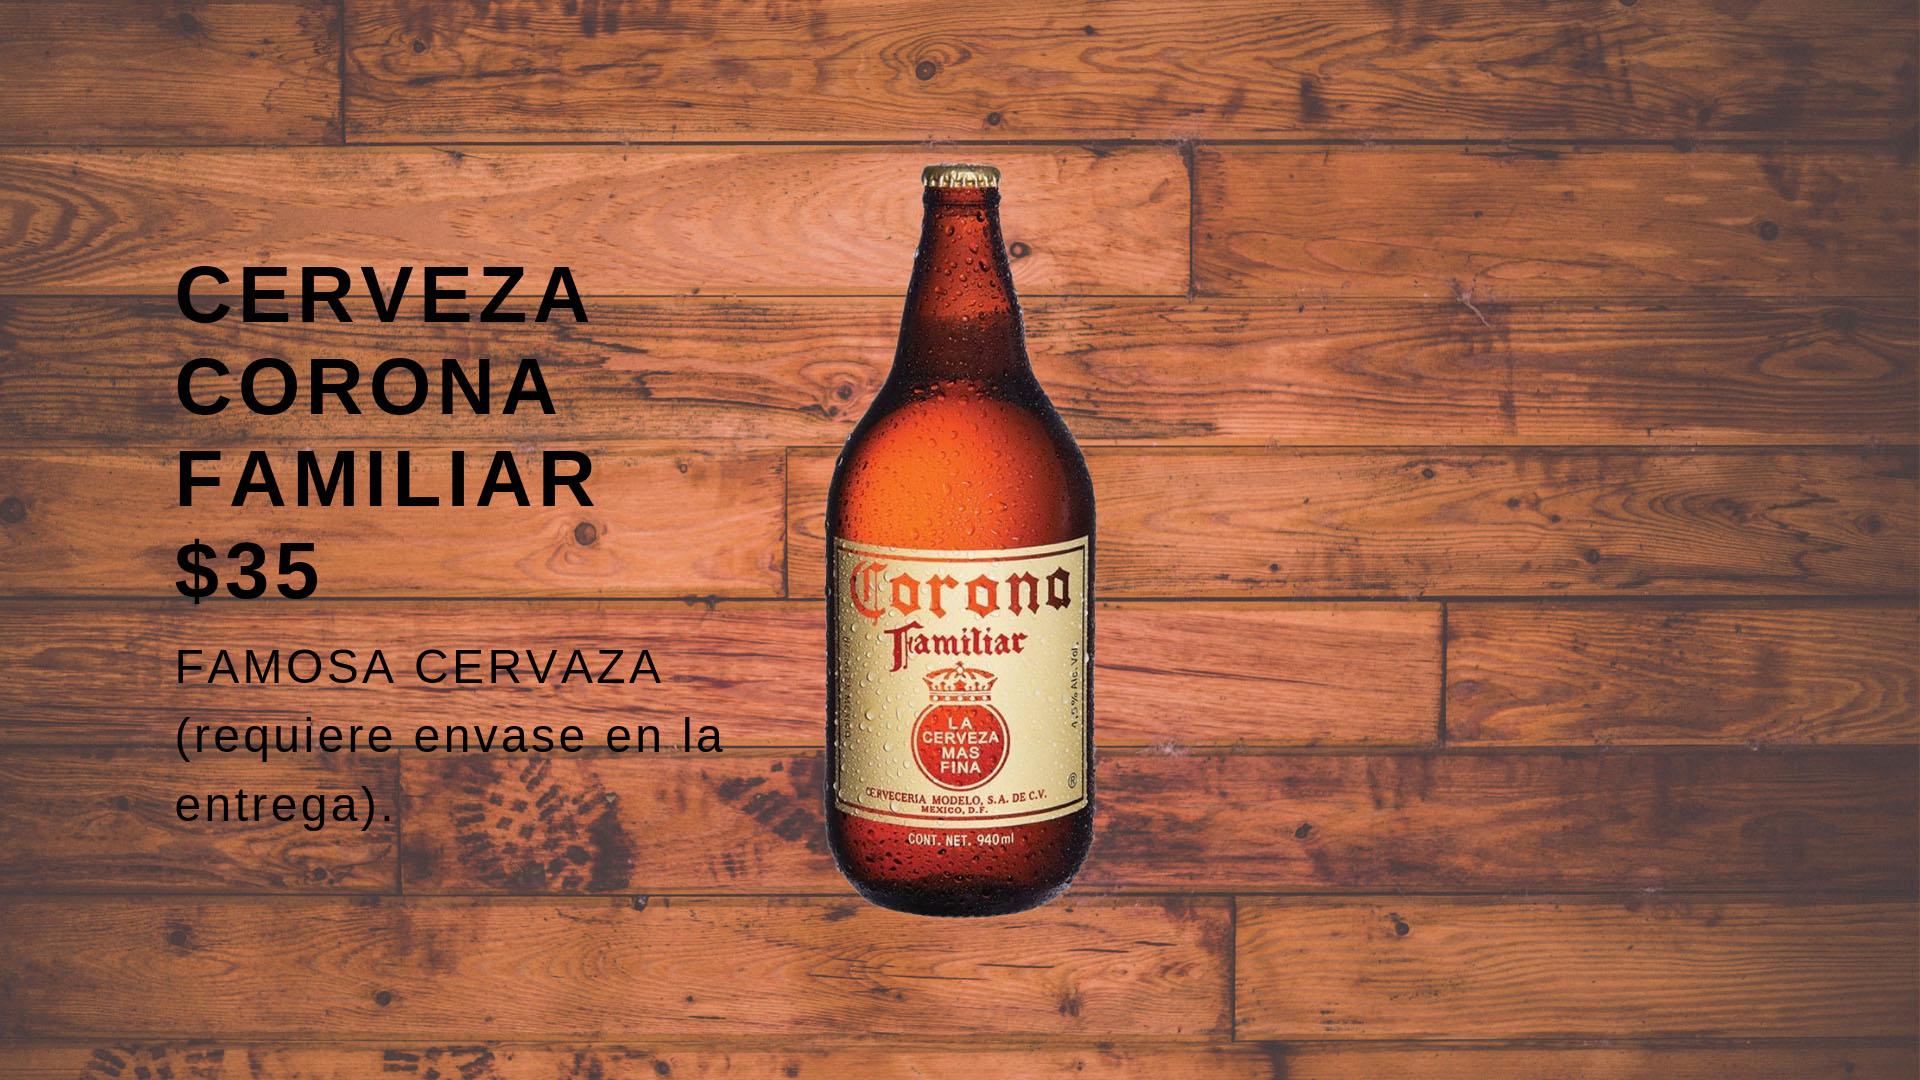 Cerveza Corona Familiar